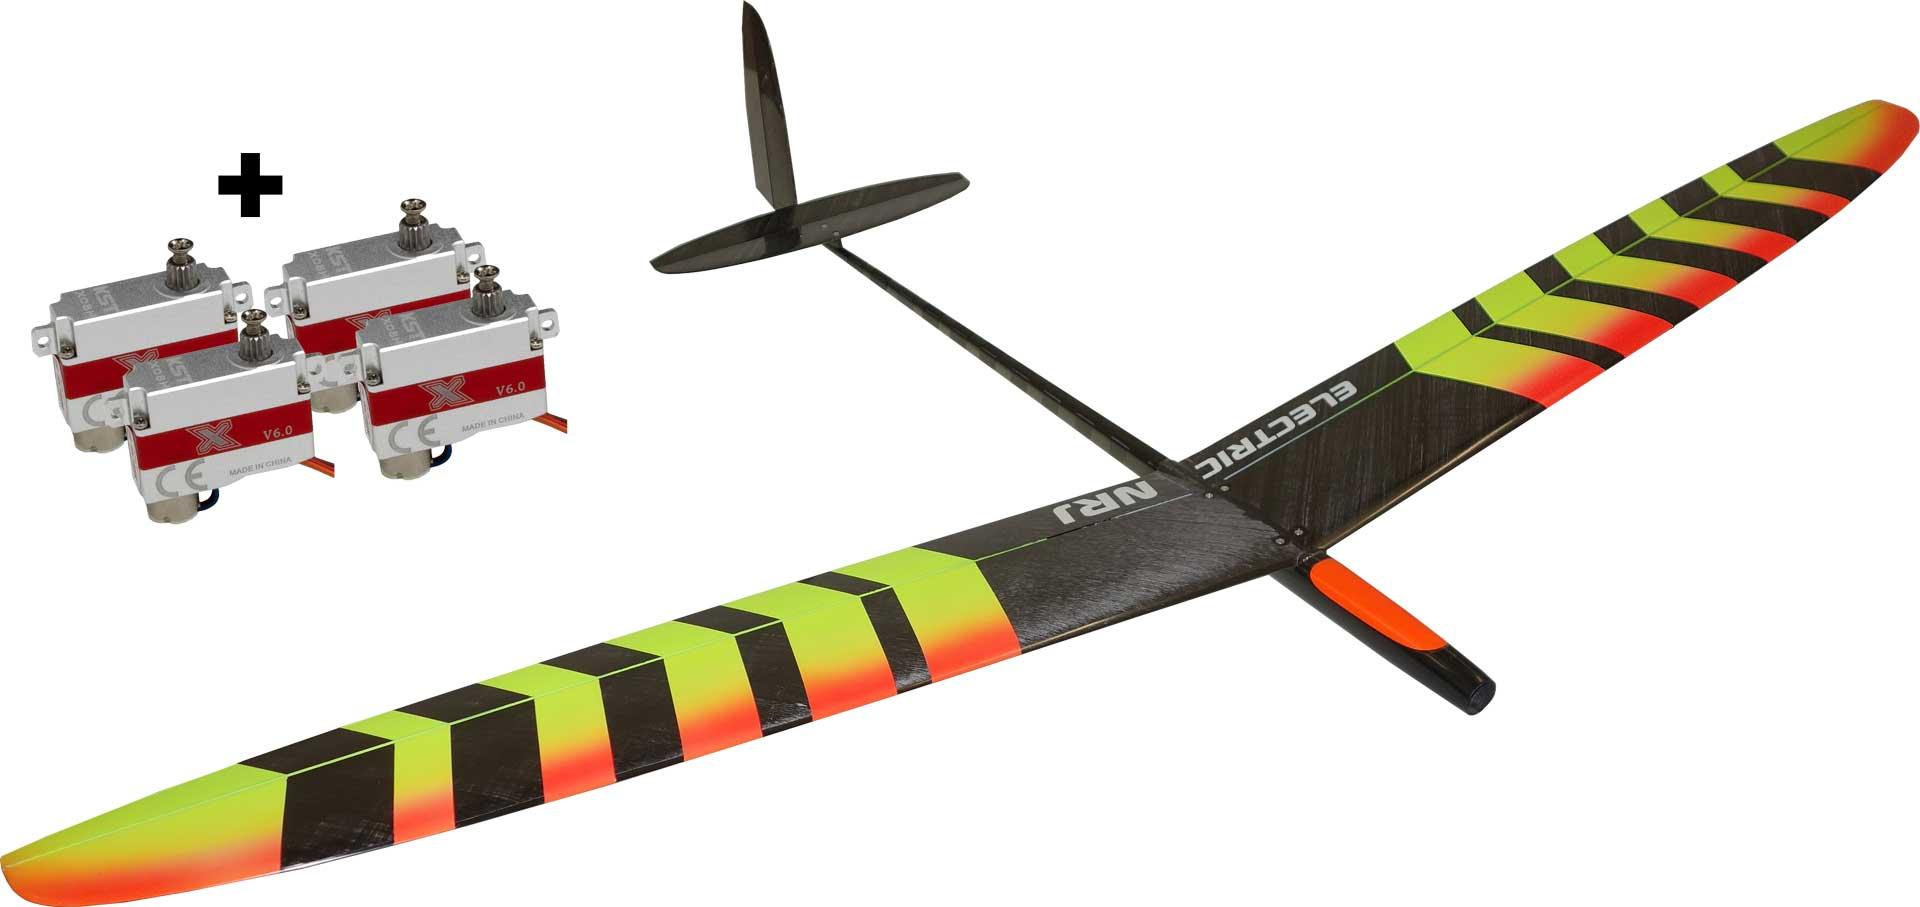 OA-Composites NRJ F5K Electric + KST X08H Servoset Farbe # C Gelb/orange